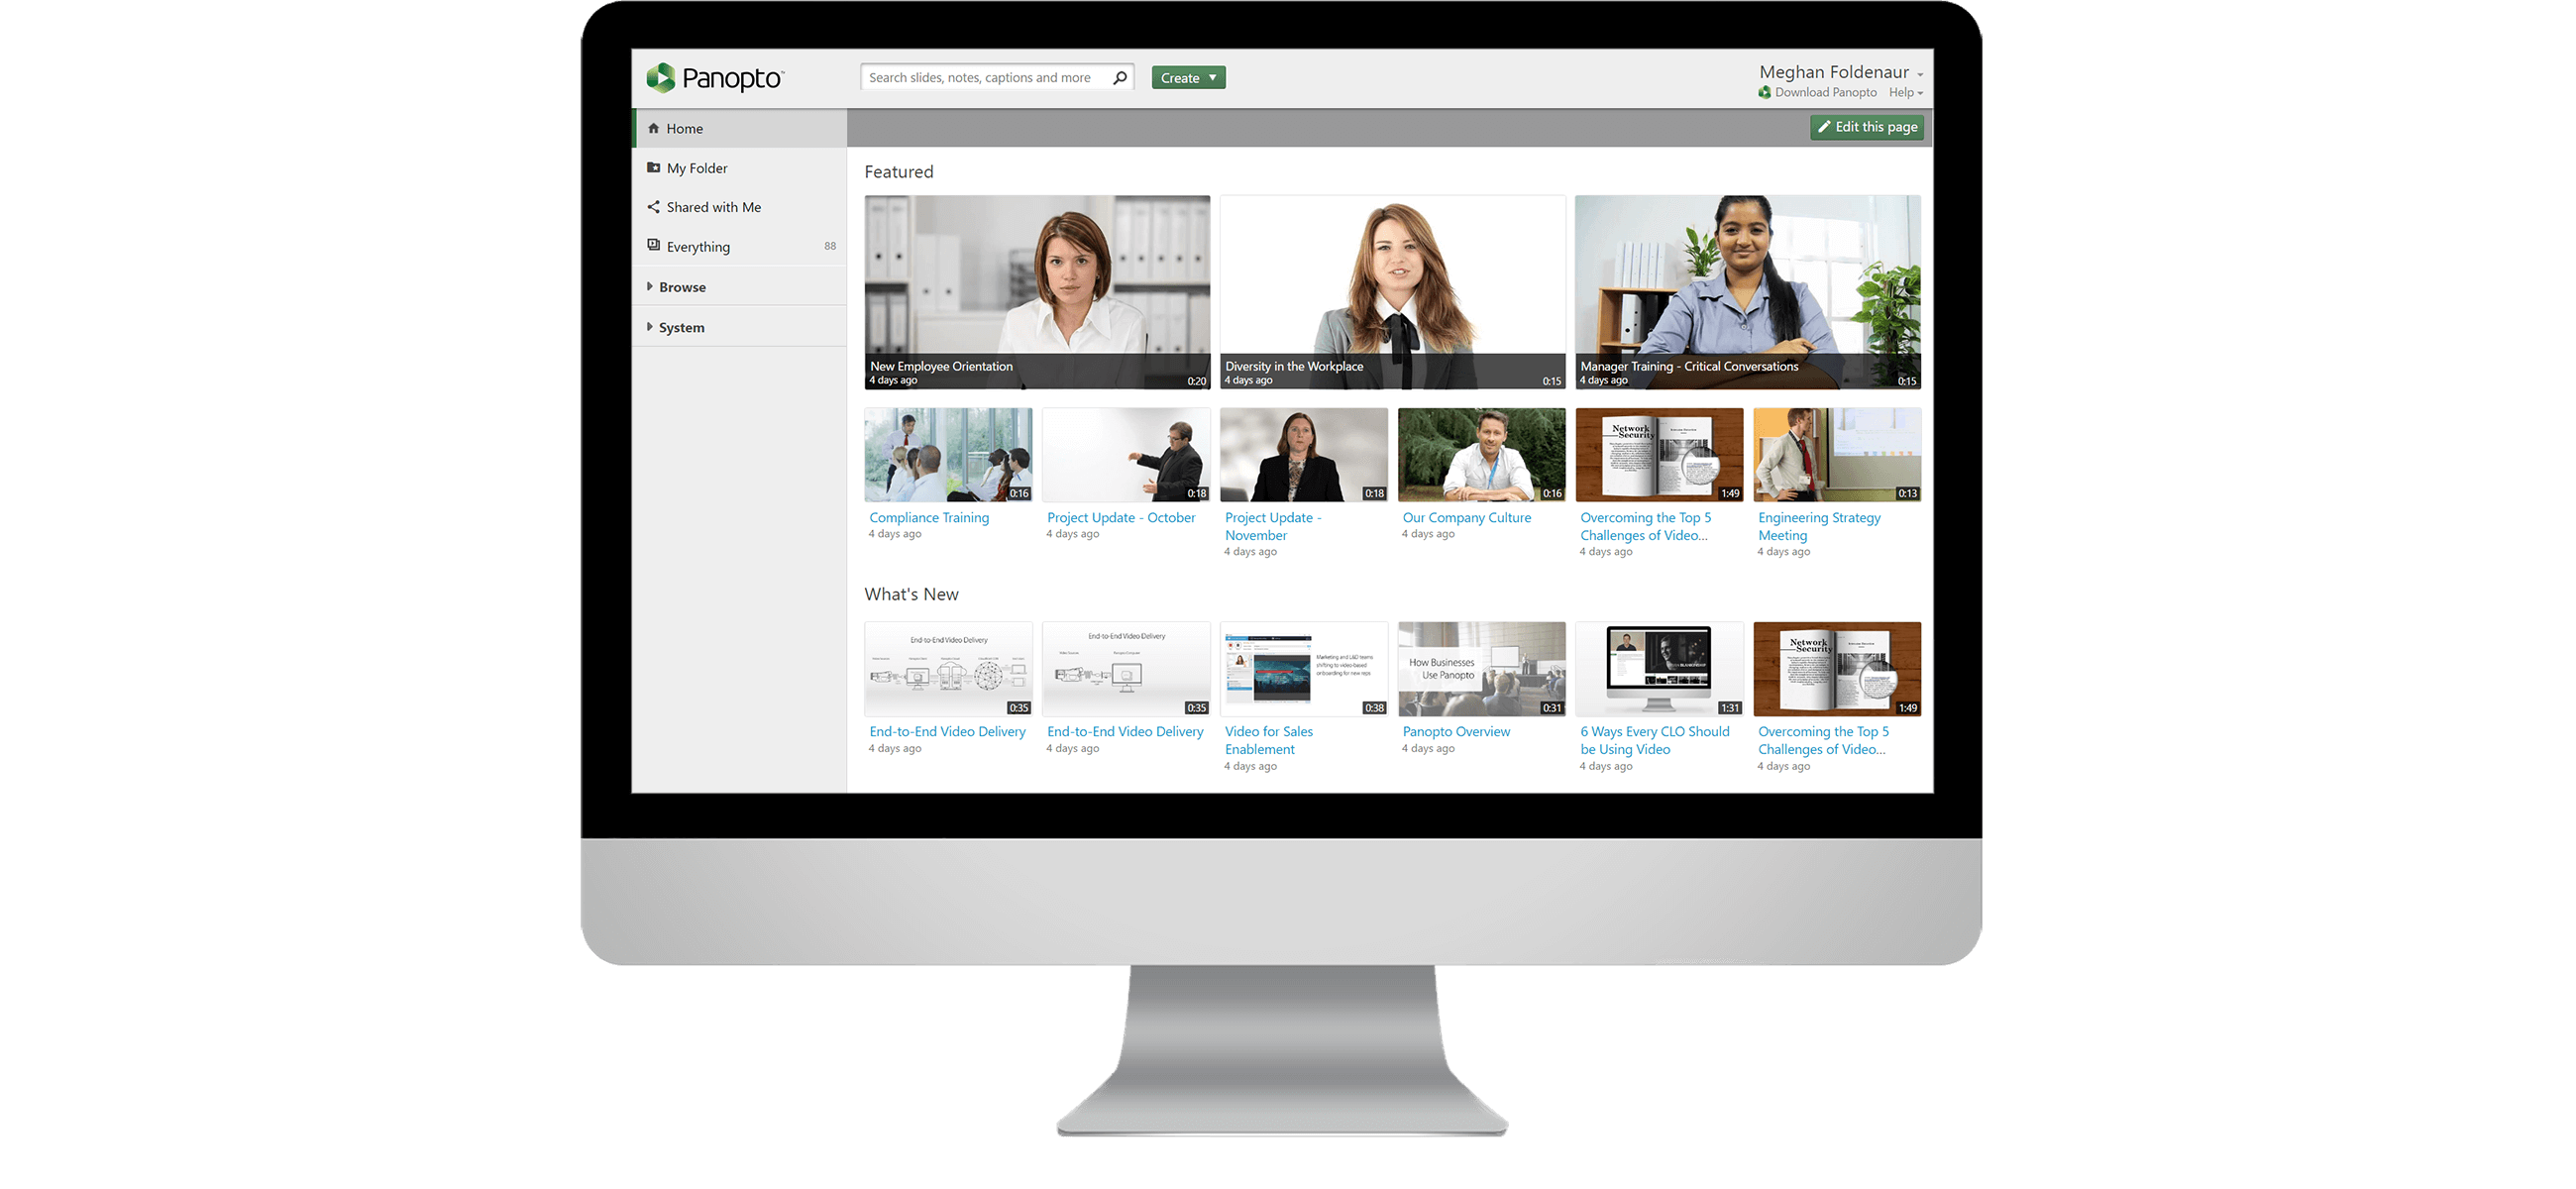 Video Content Management System - Panopto Video Platform